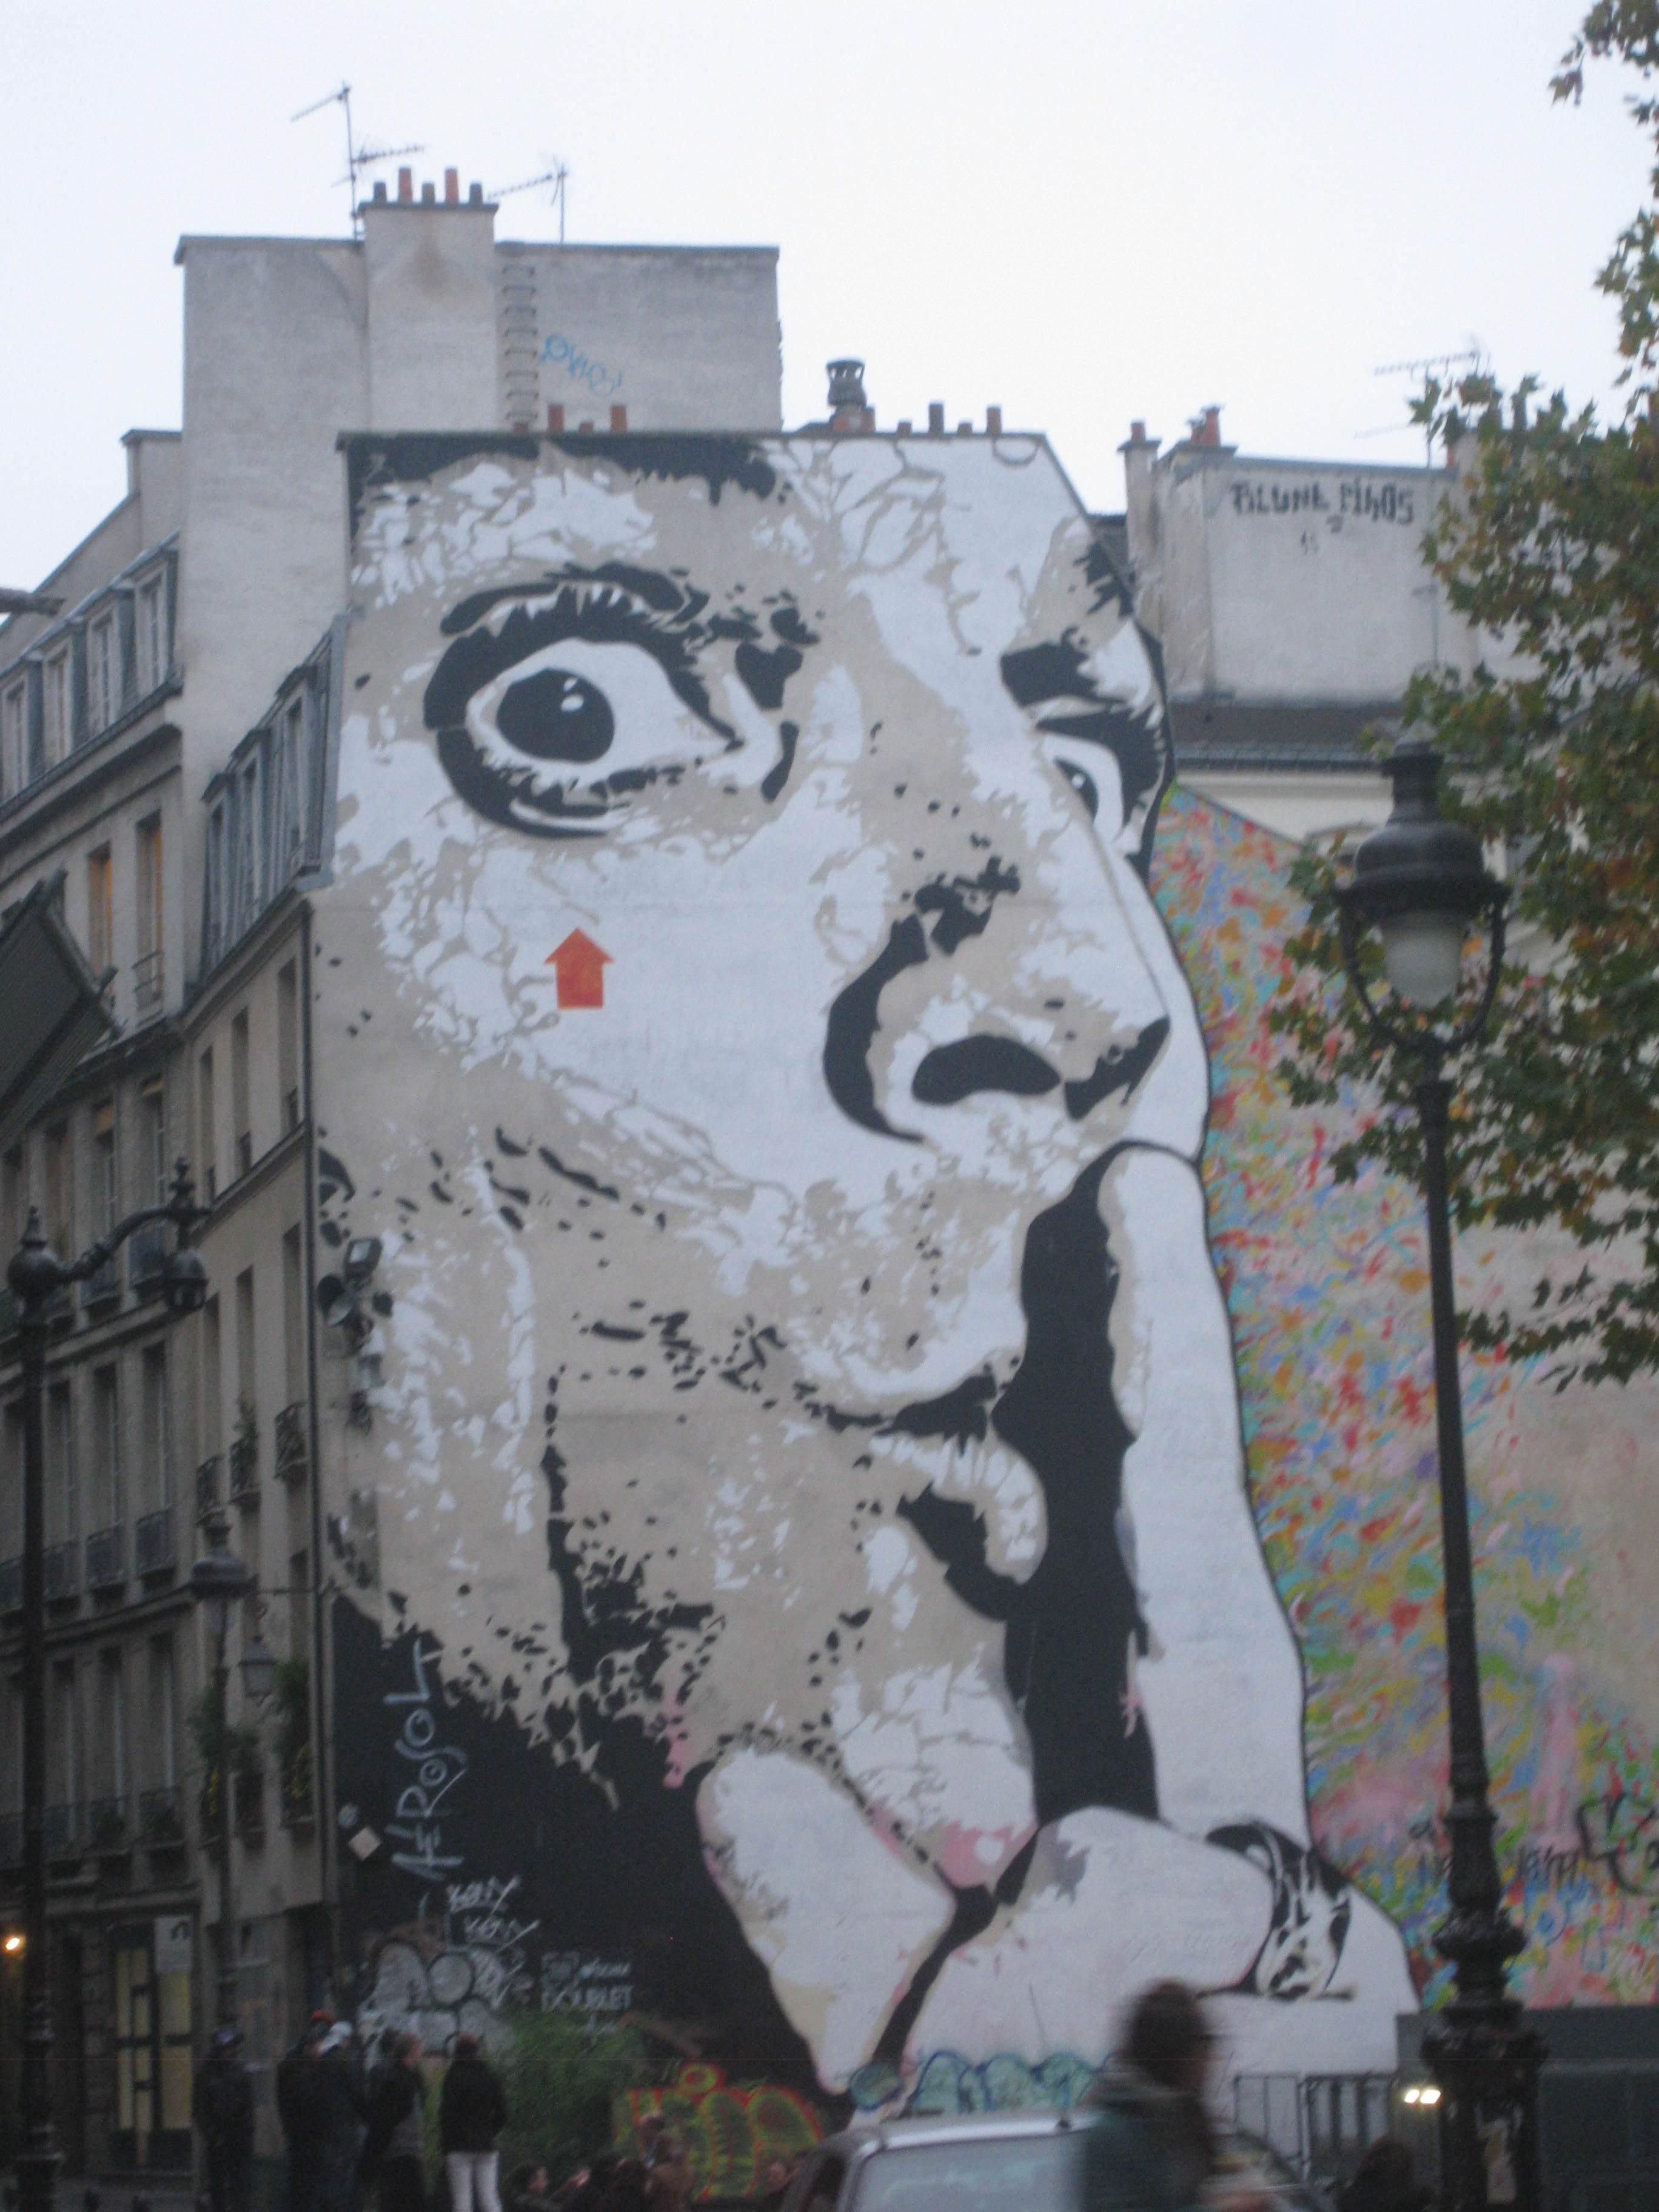 Paris Street Art Mural near Centre Pompidou